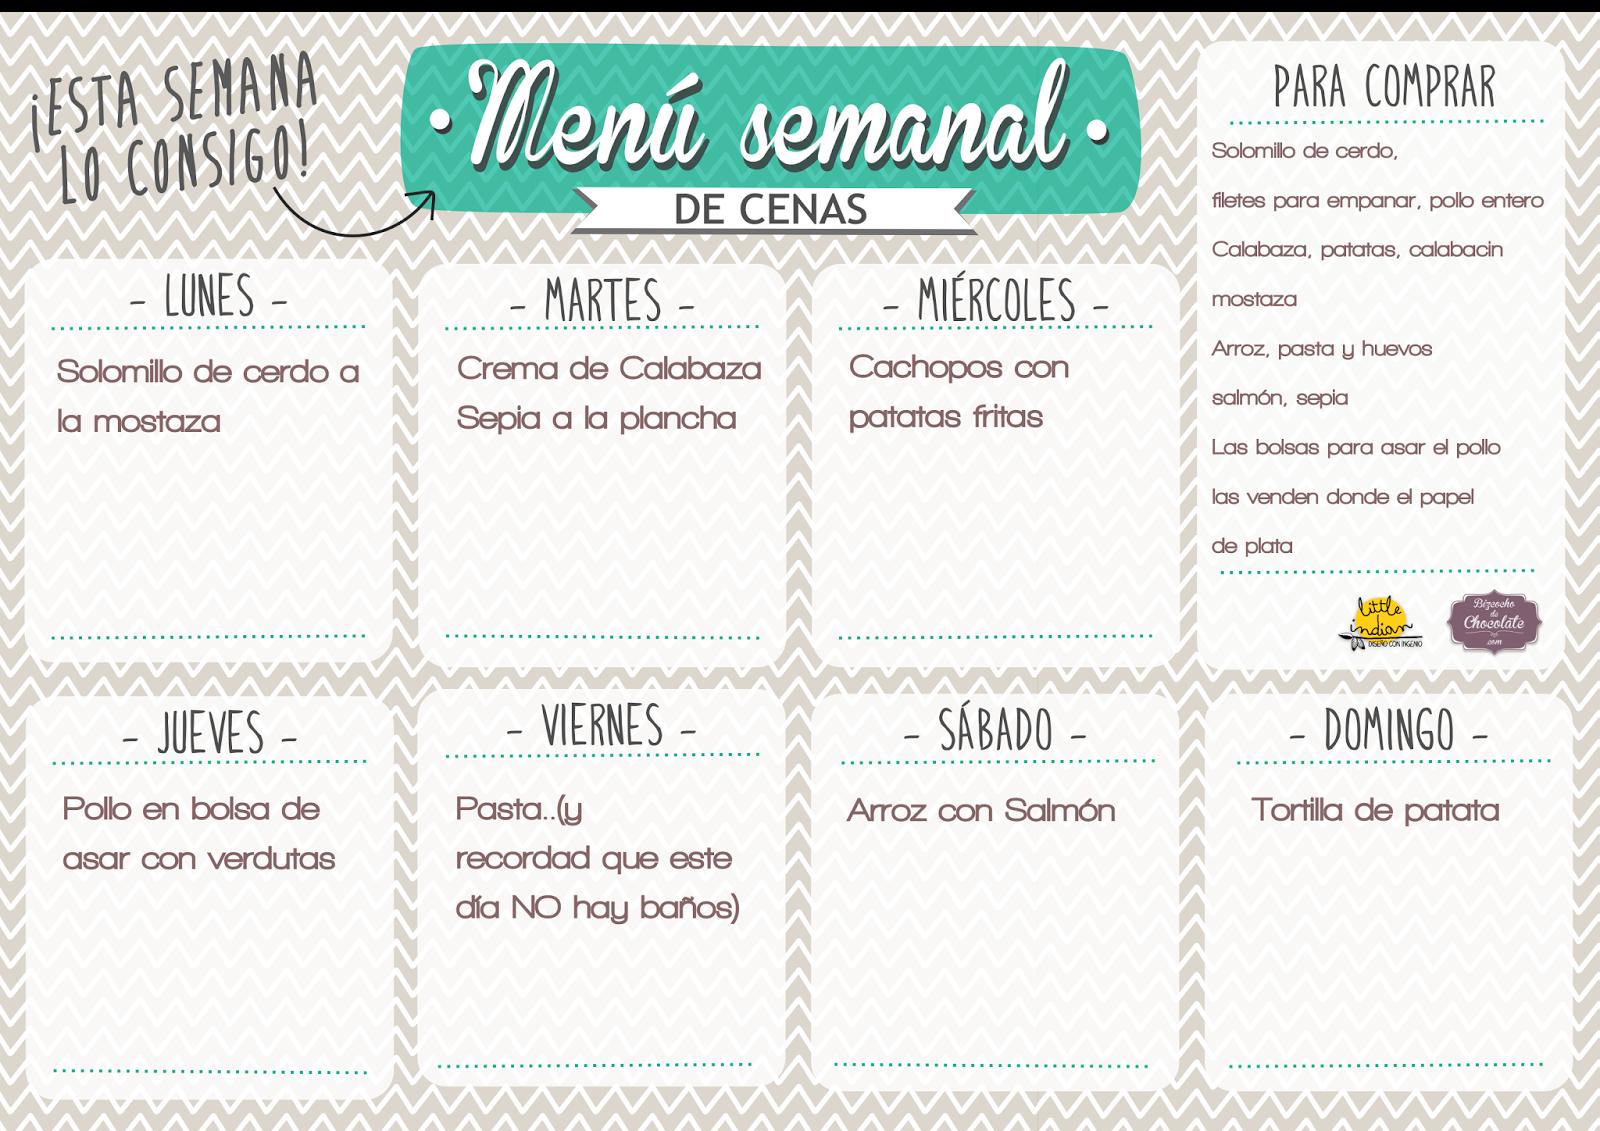 Bizcocho de Chocolate: menu semanal